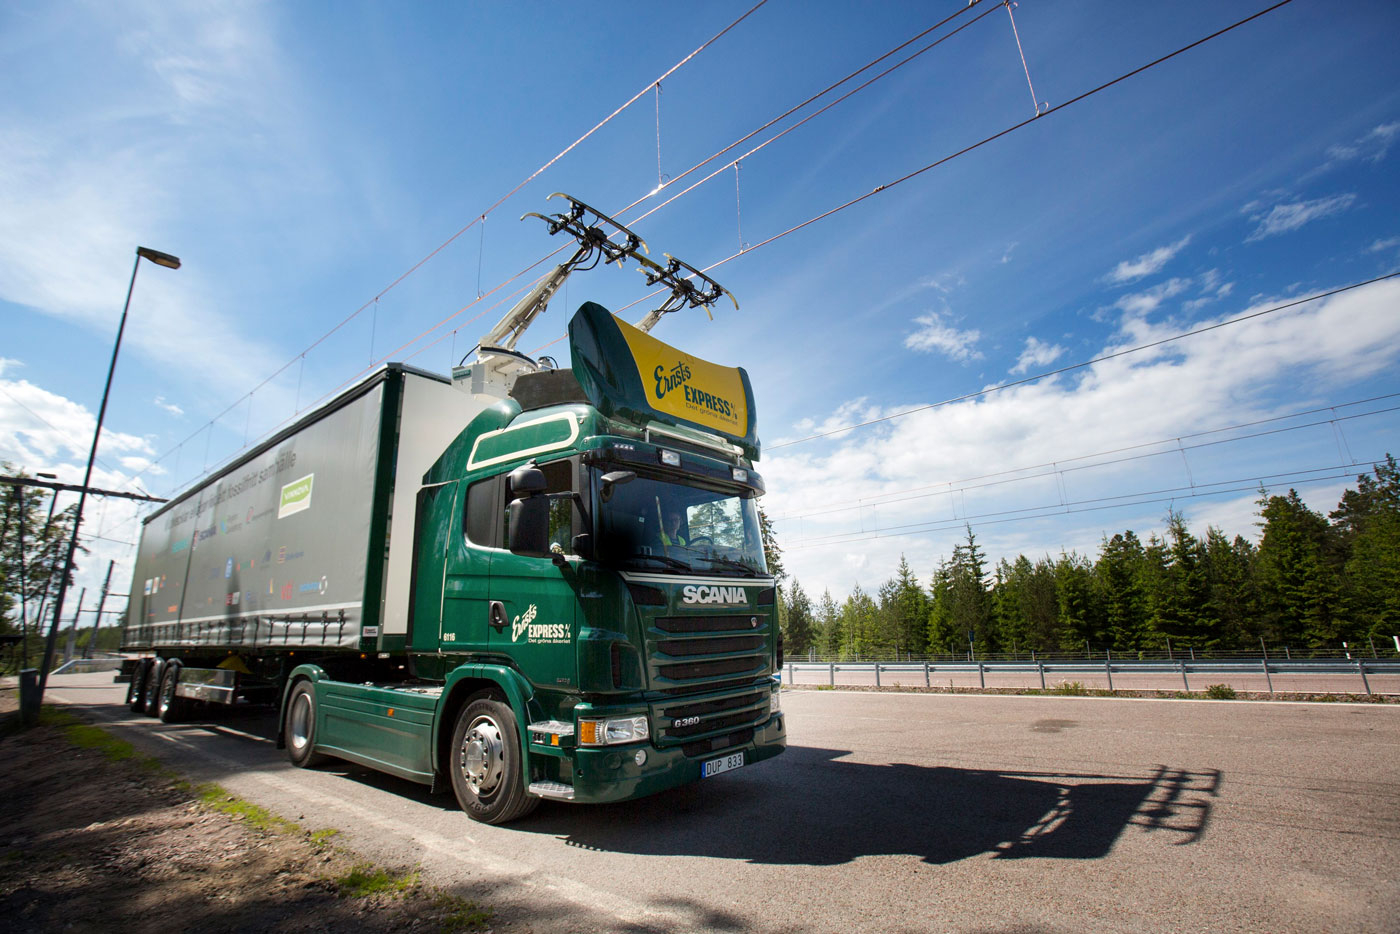 Suecia abre la primera carretera eléctrica del mundo S.aolcdn